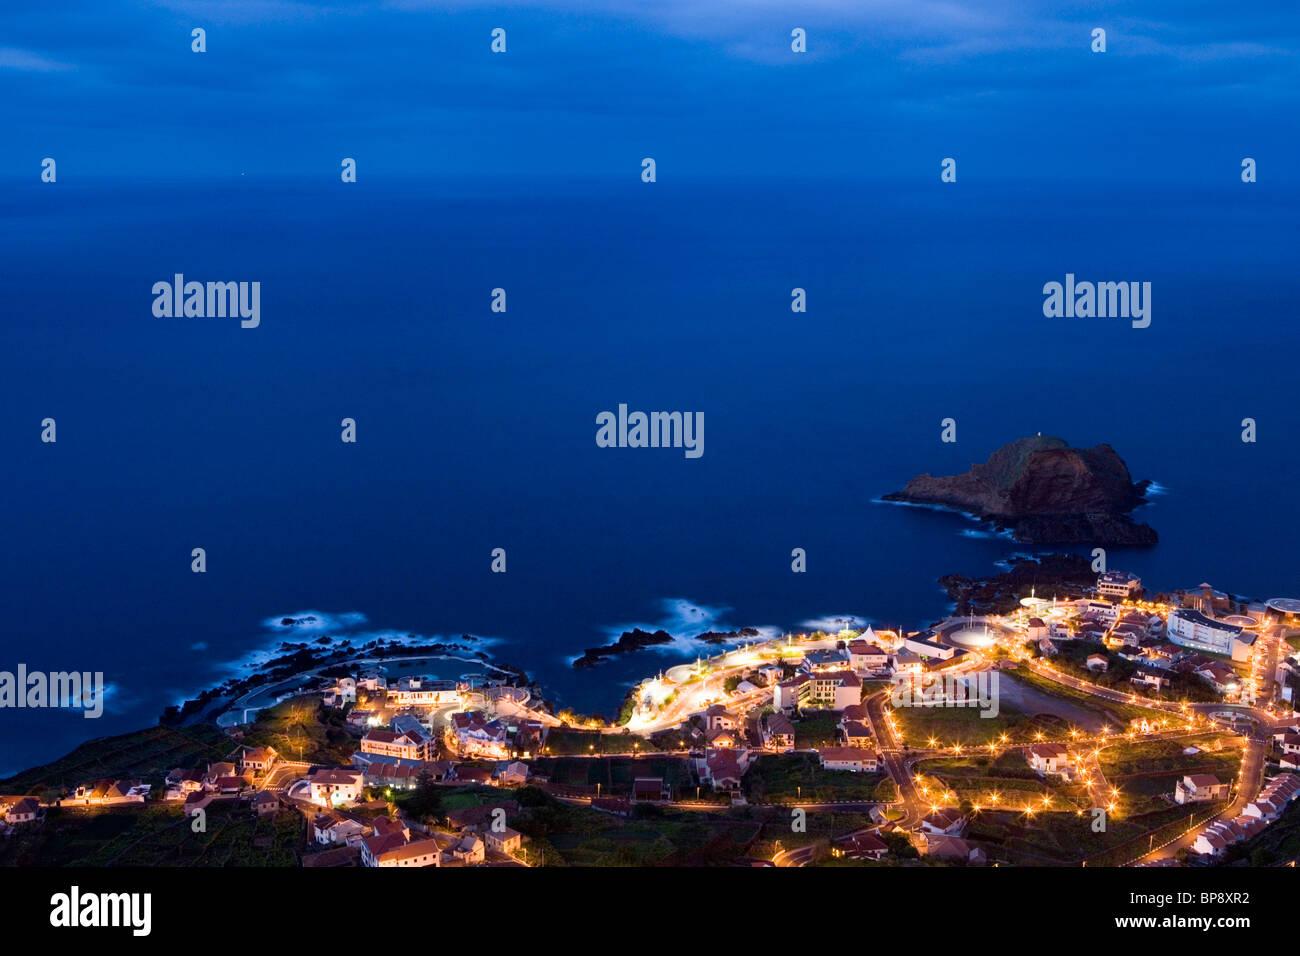 Town and Natural Rock Pools seen from Miradouro da Santinha viewpoint at dusk, Porto Moniz, Madeira, Portugal - Stock Image